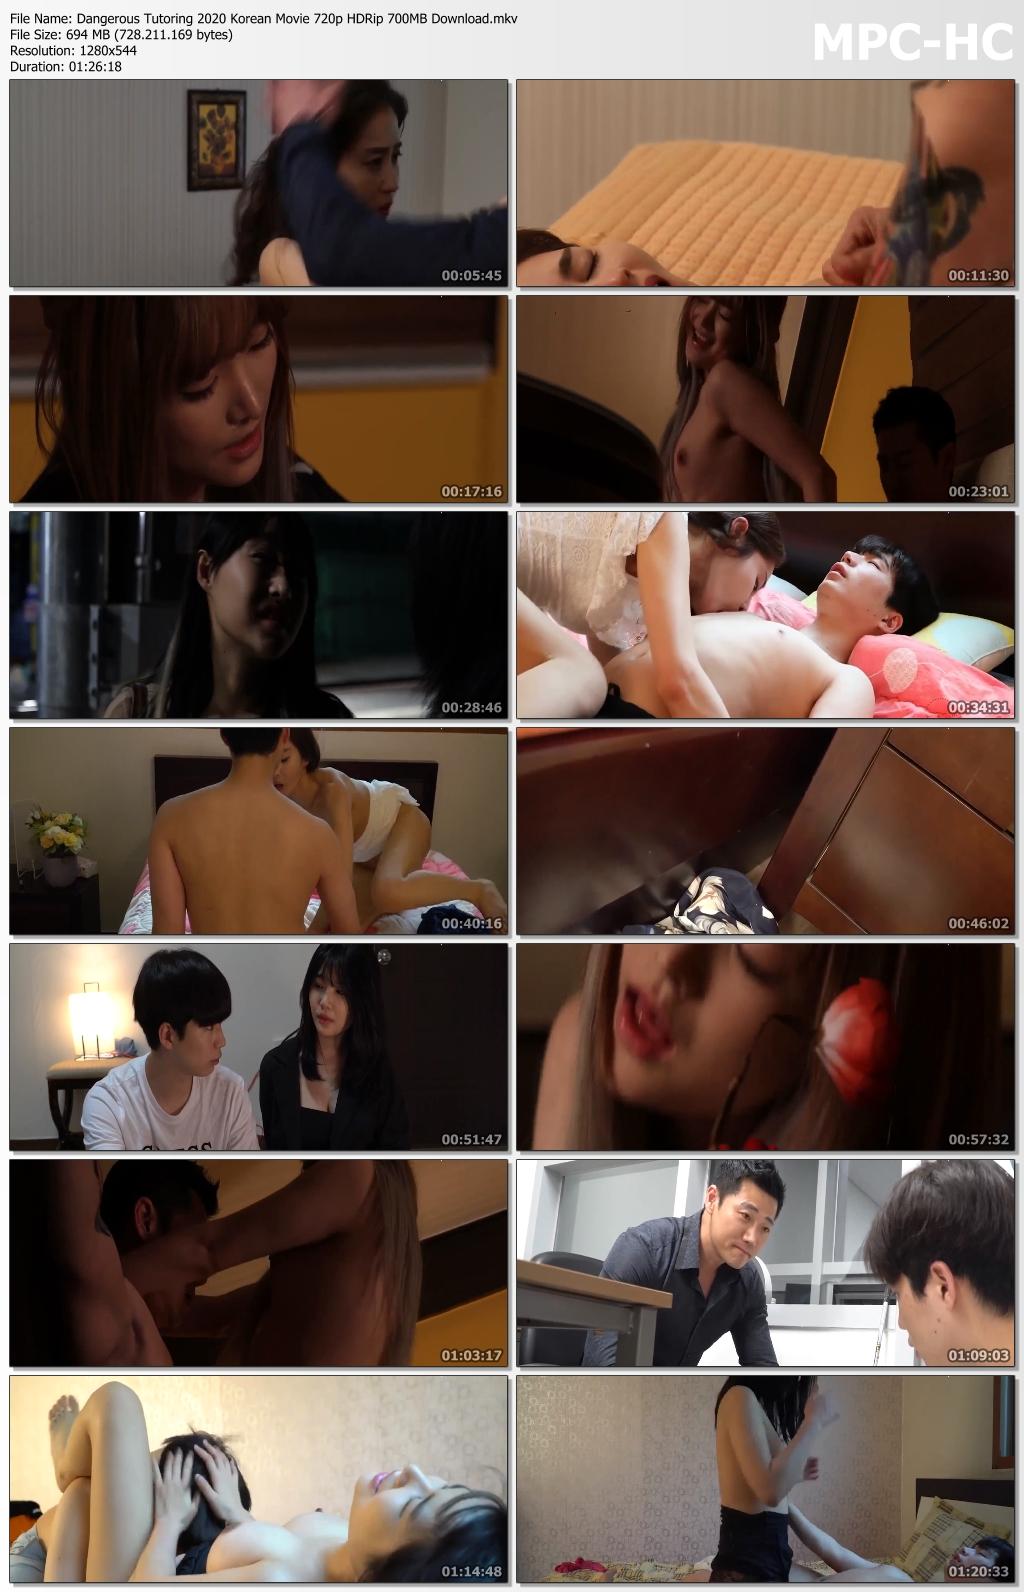 Dangerous-Tutoring-2020-Korean-Movie-720p-HDRip-700-MB-Download-mkv-thumbs